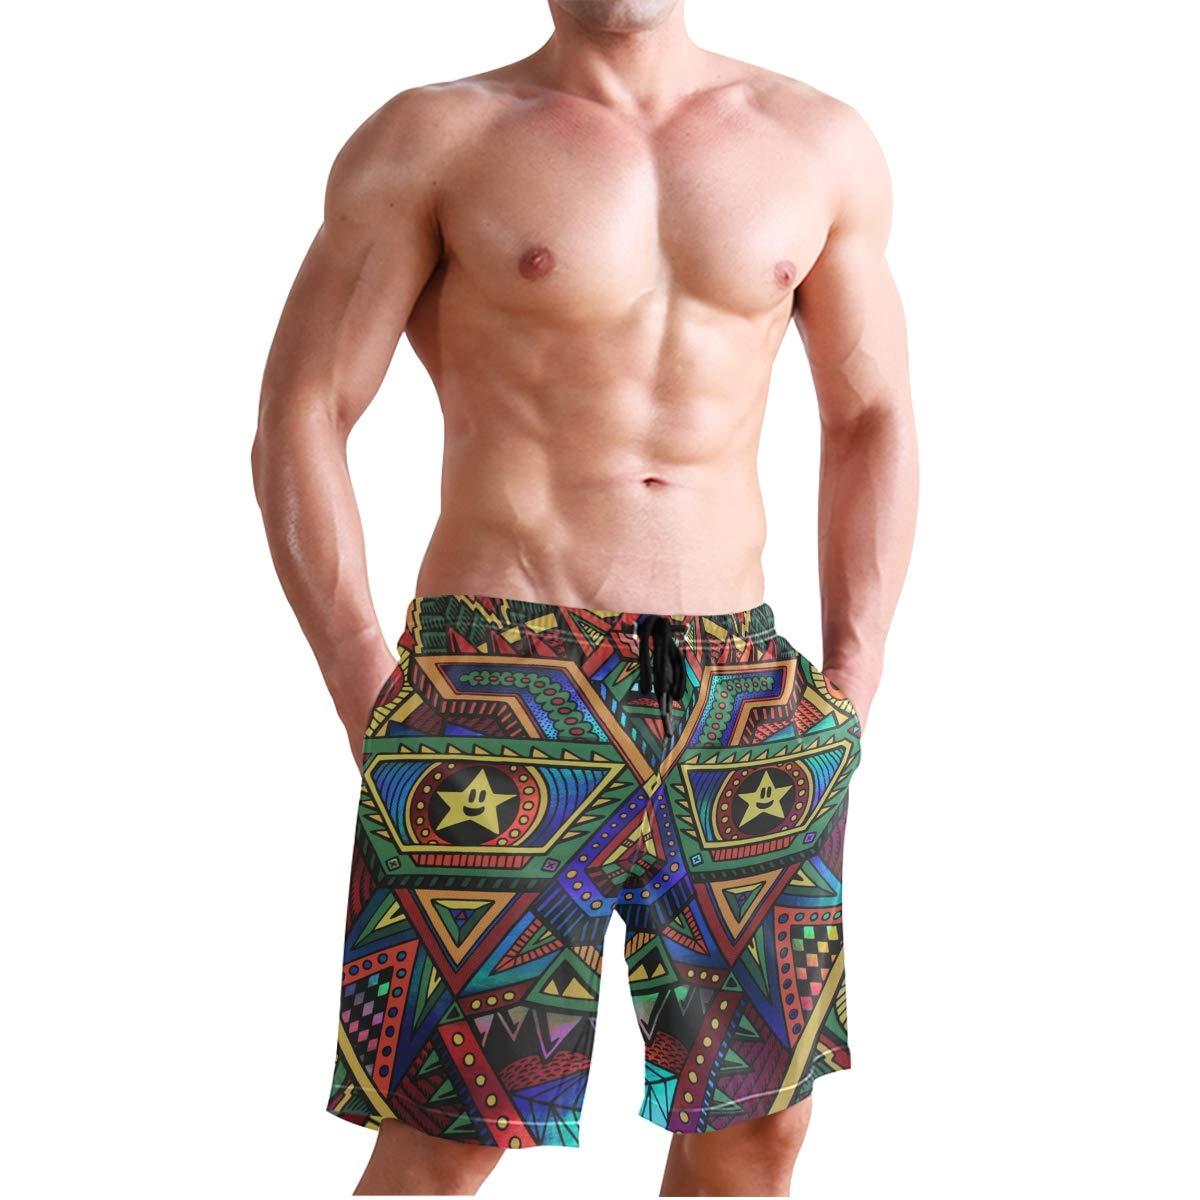 DEYYA Rainbow Flower Mandala Summer Beach Shorts Pants Mens Swim Trunks Board Short for Men